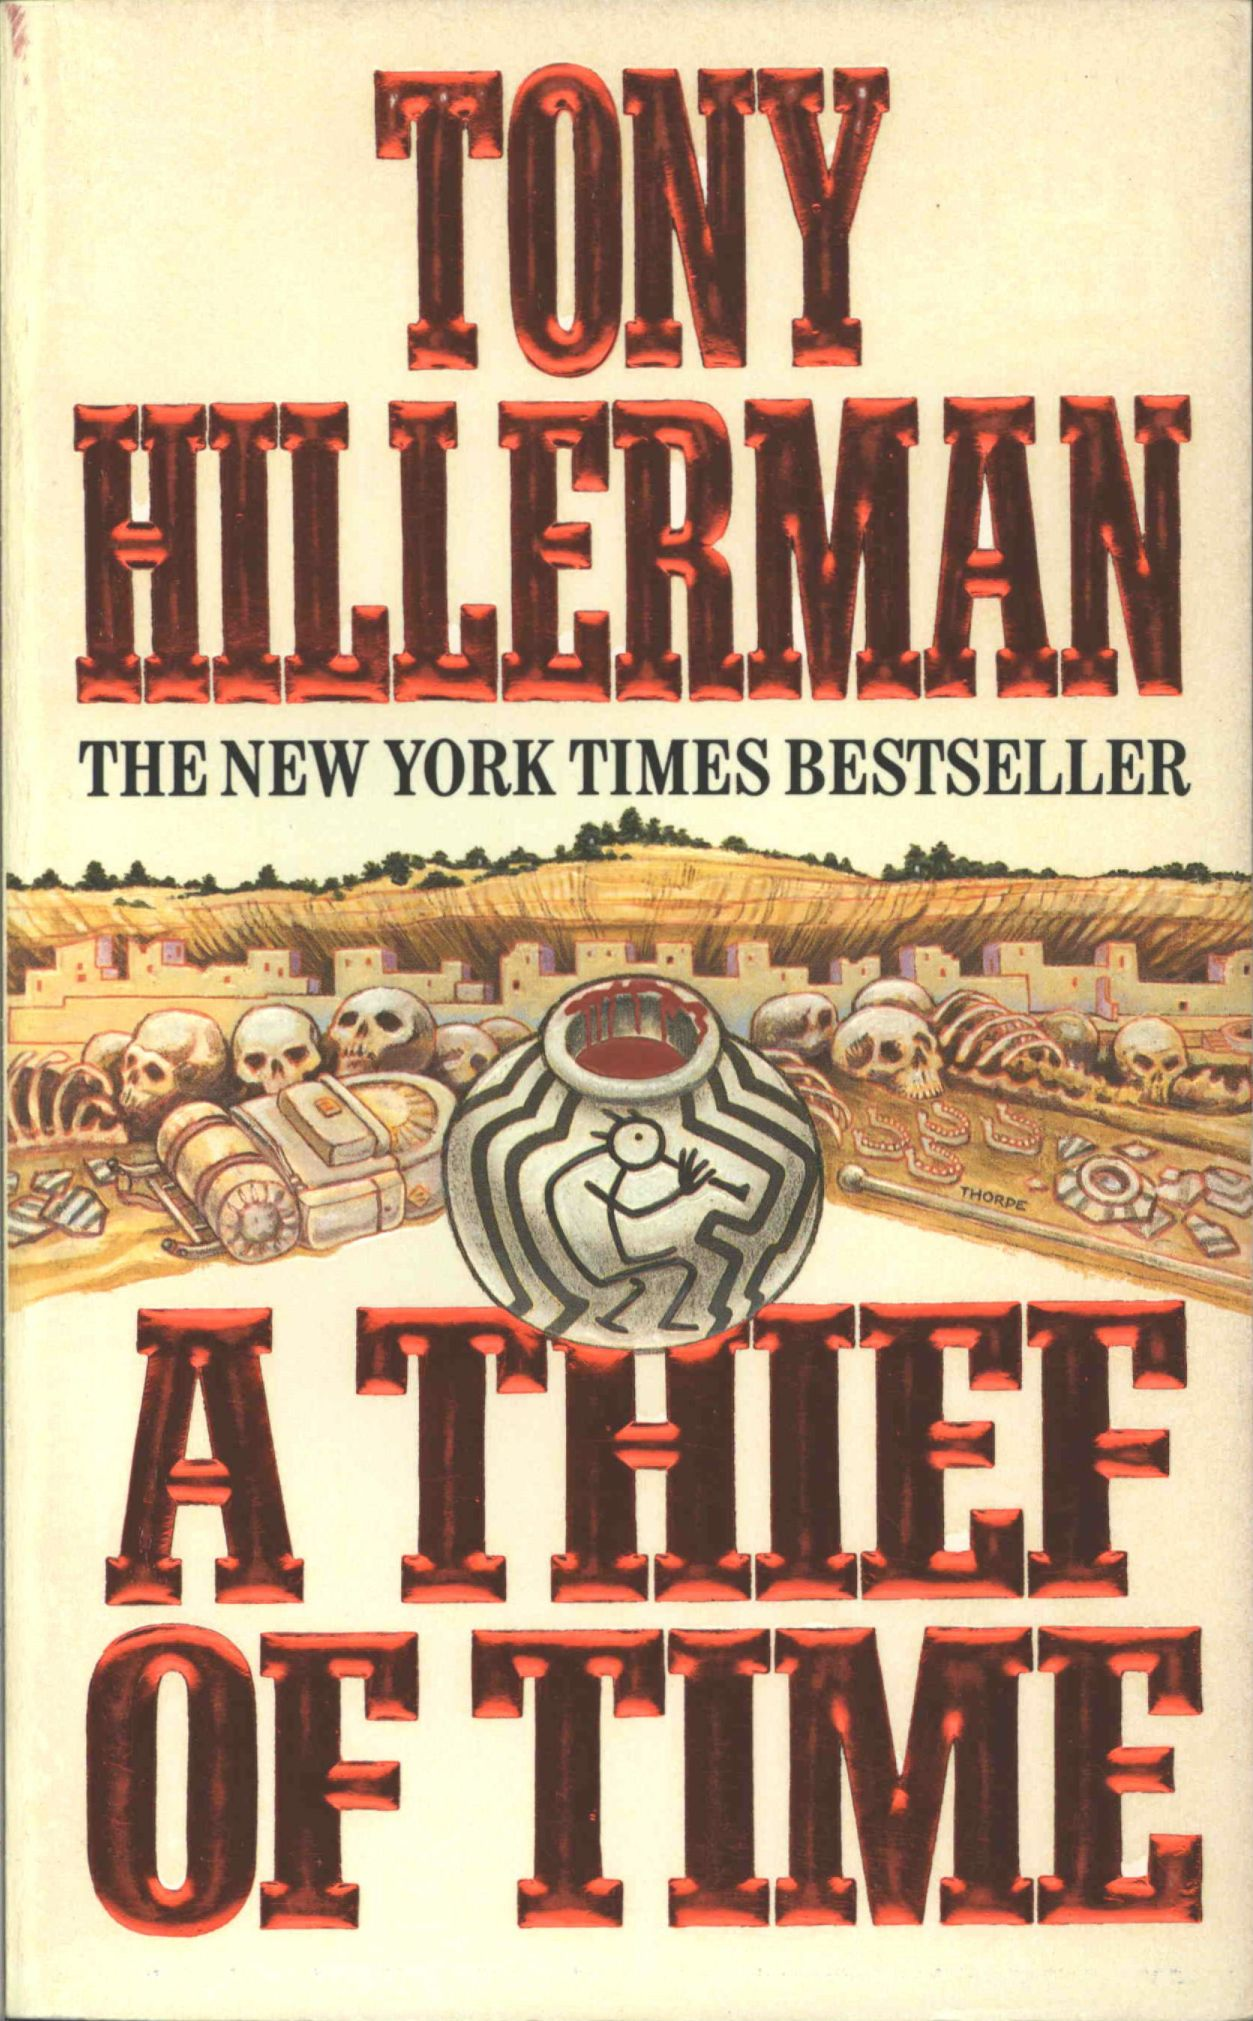 toni hillerman thief of time worksheet